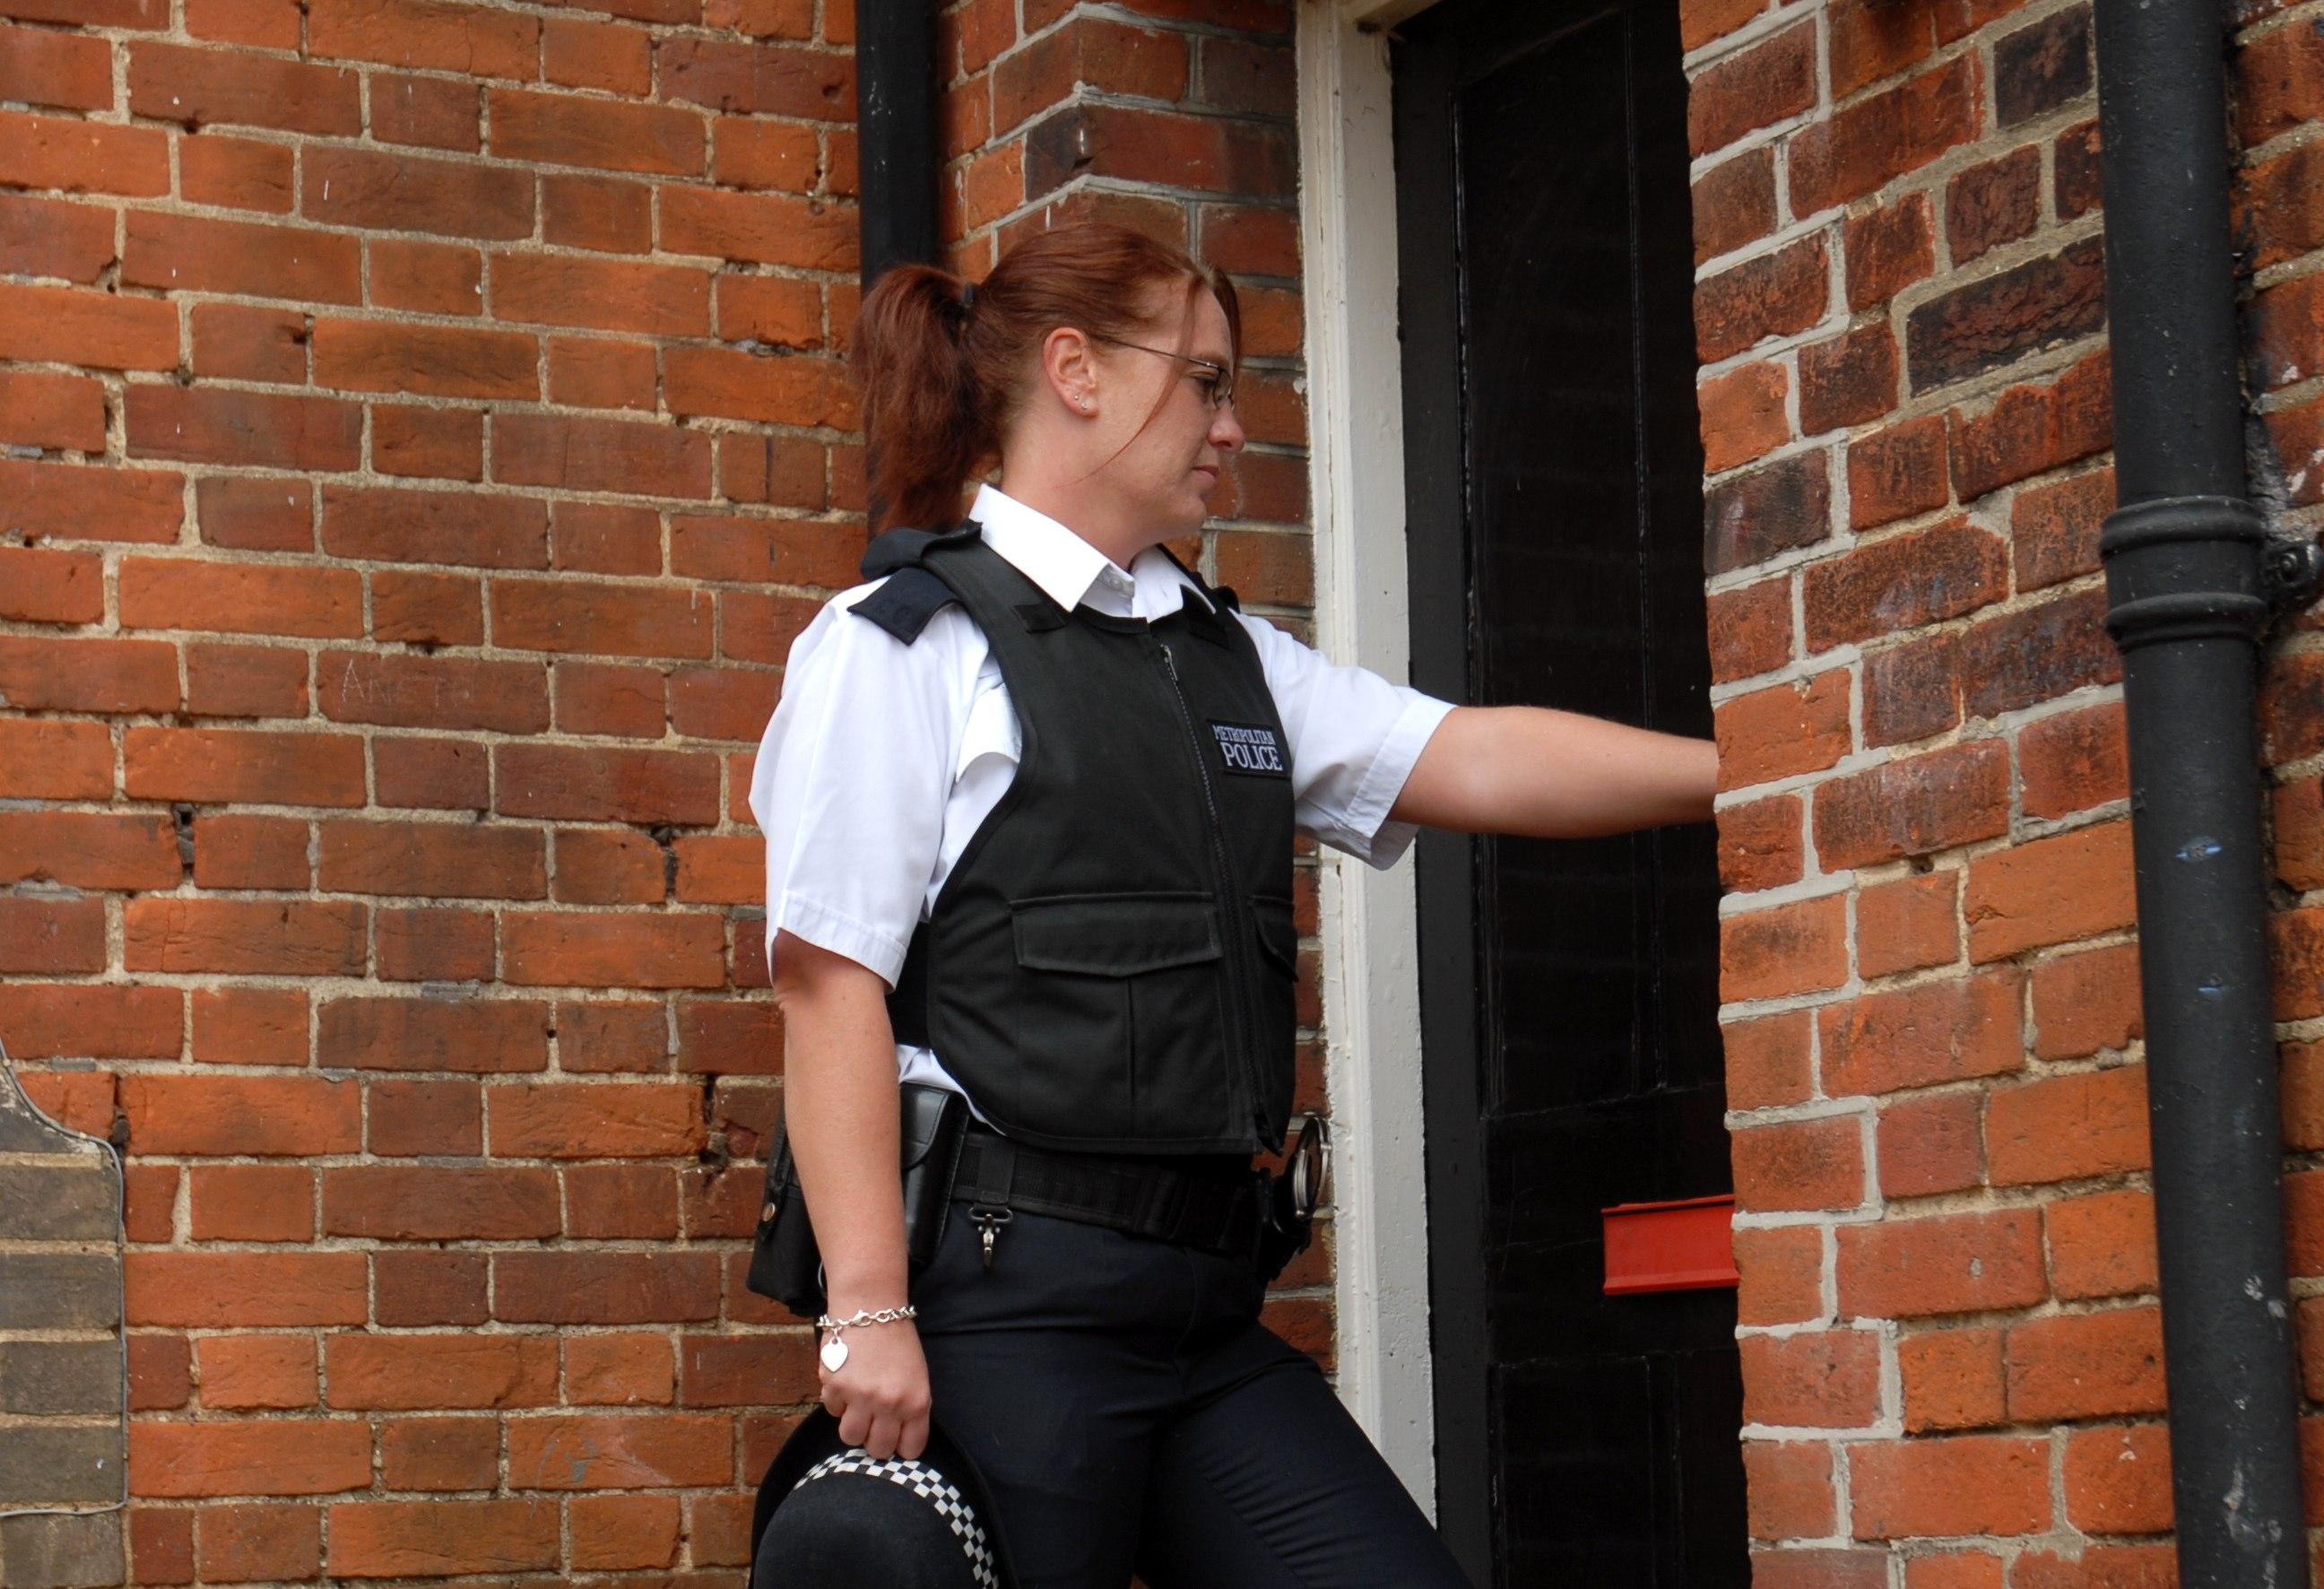 Female police officer knocking on door